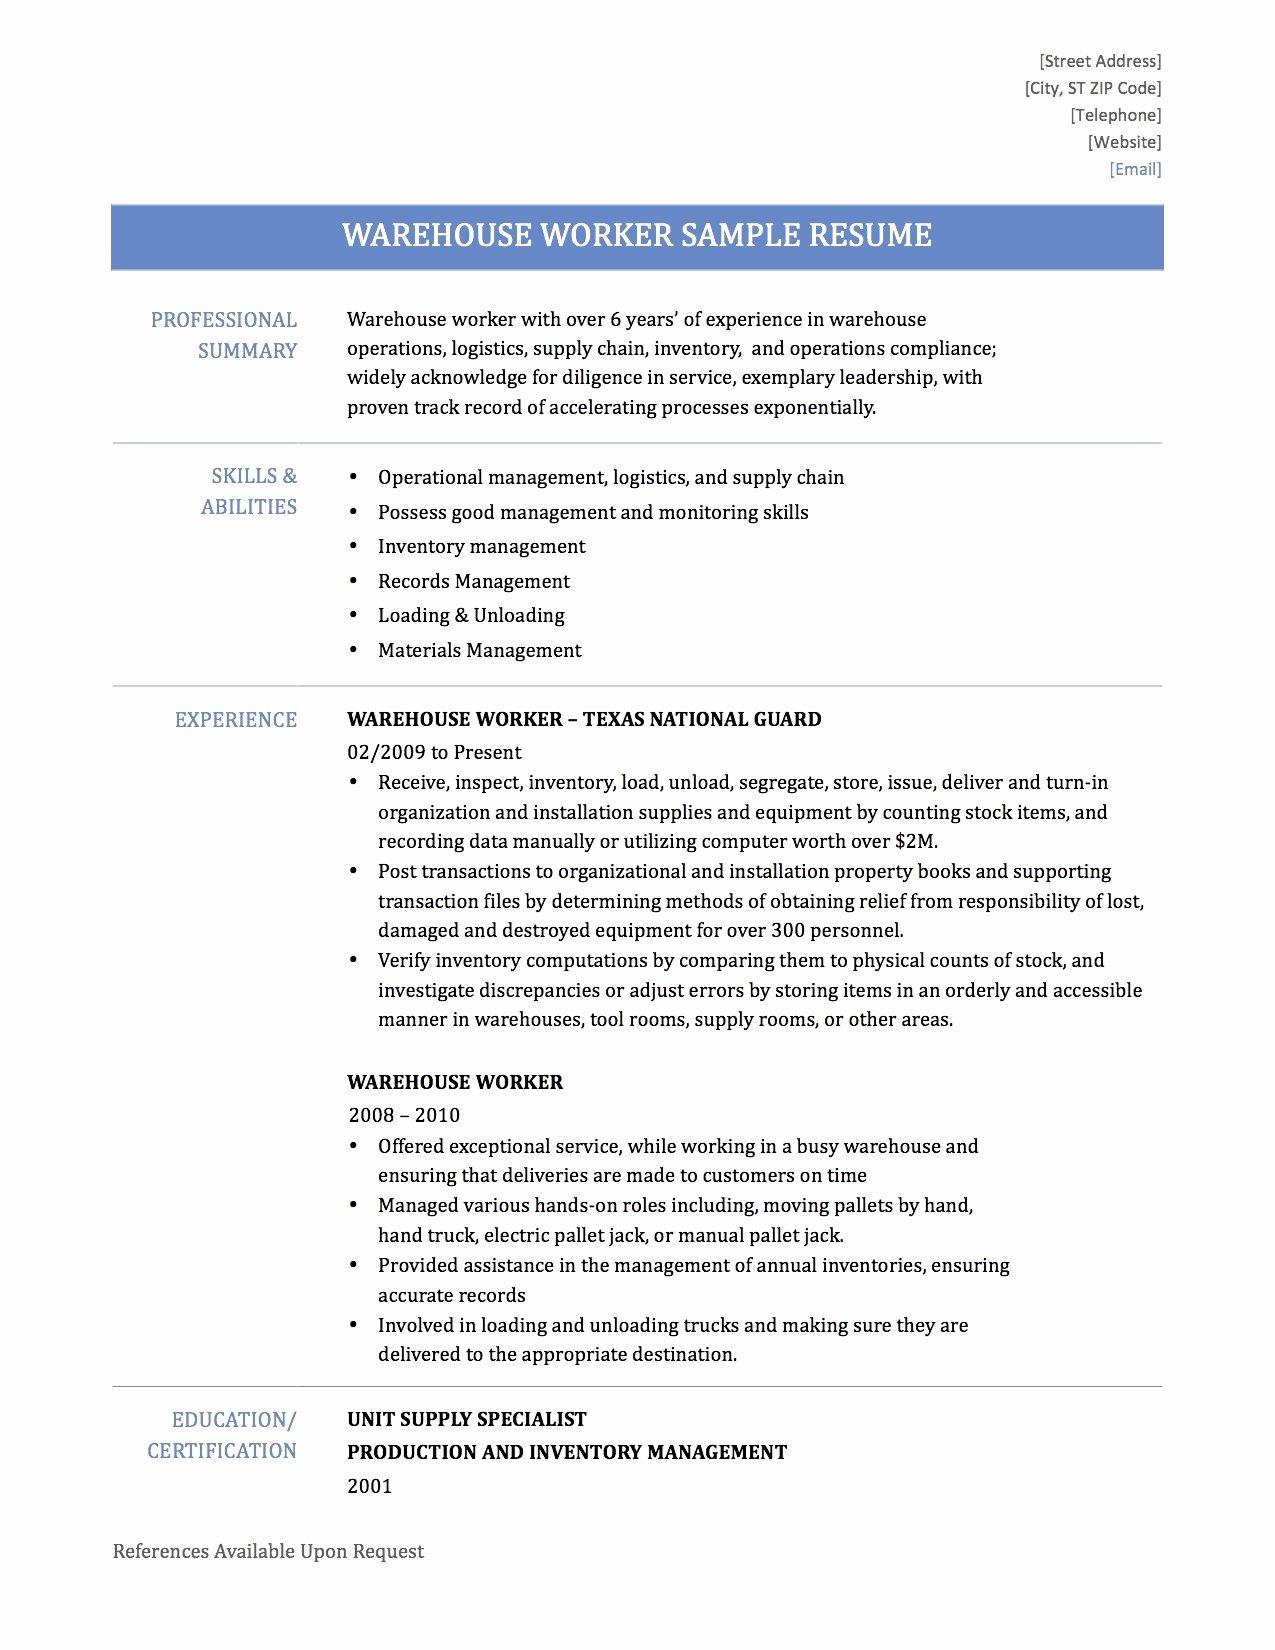 Resume Warehouse Job